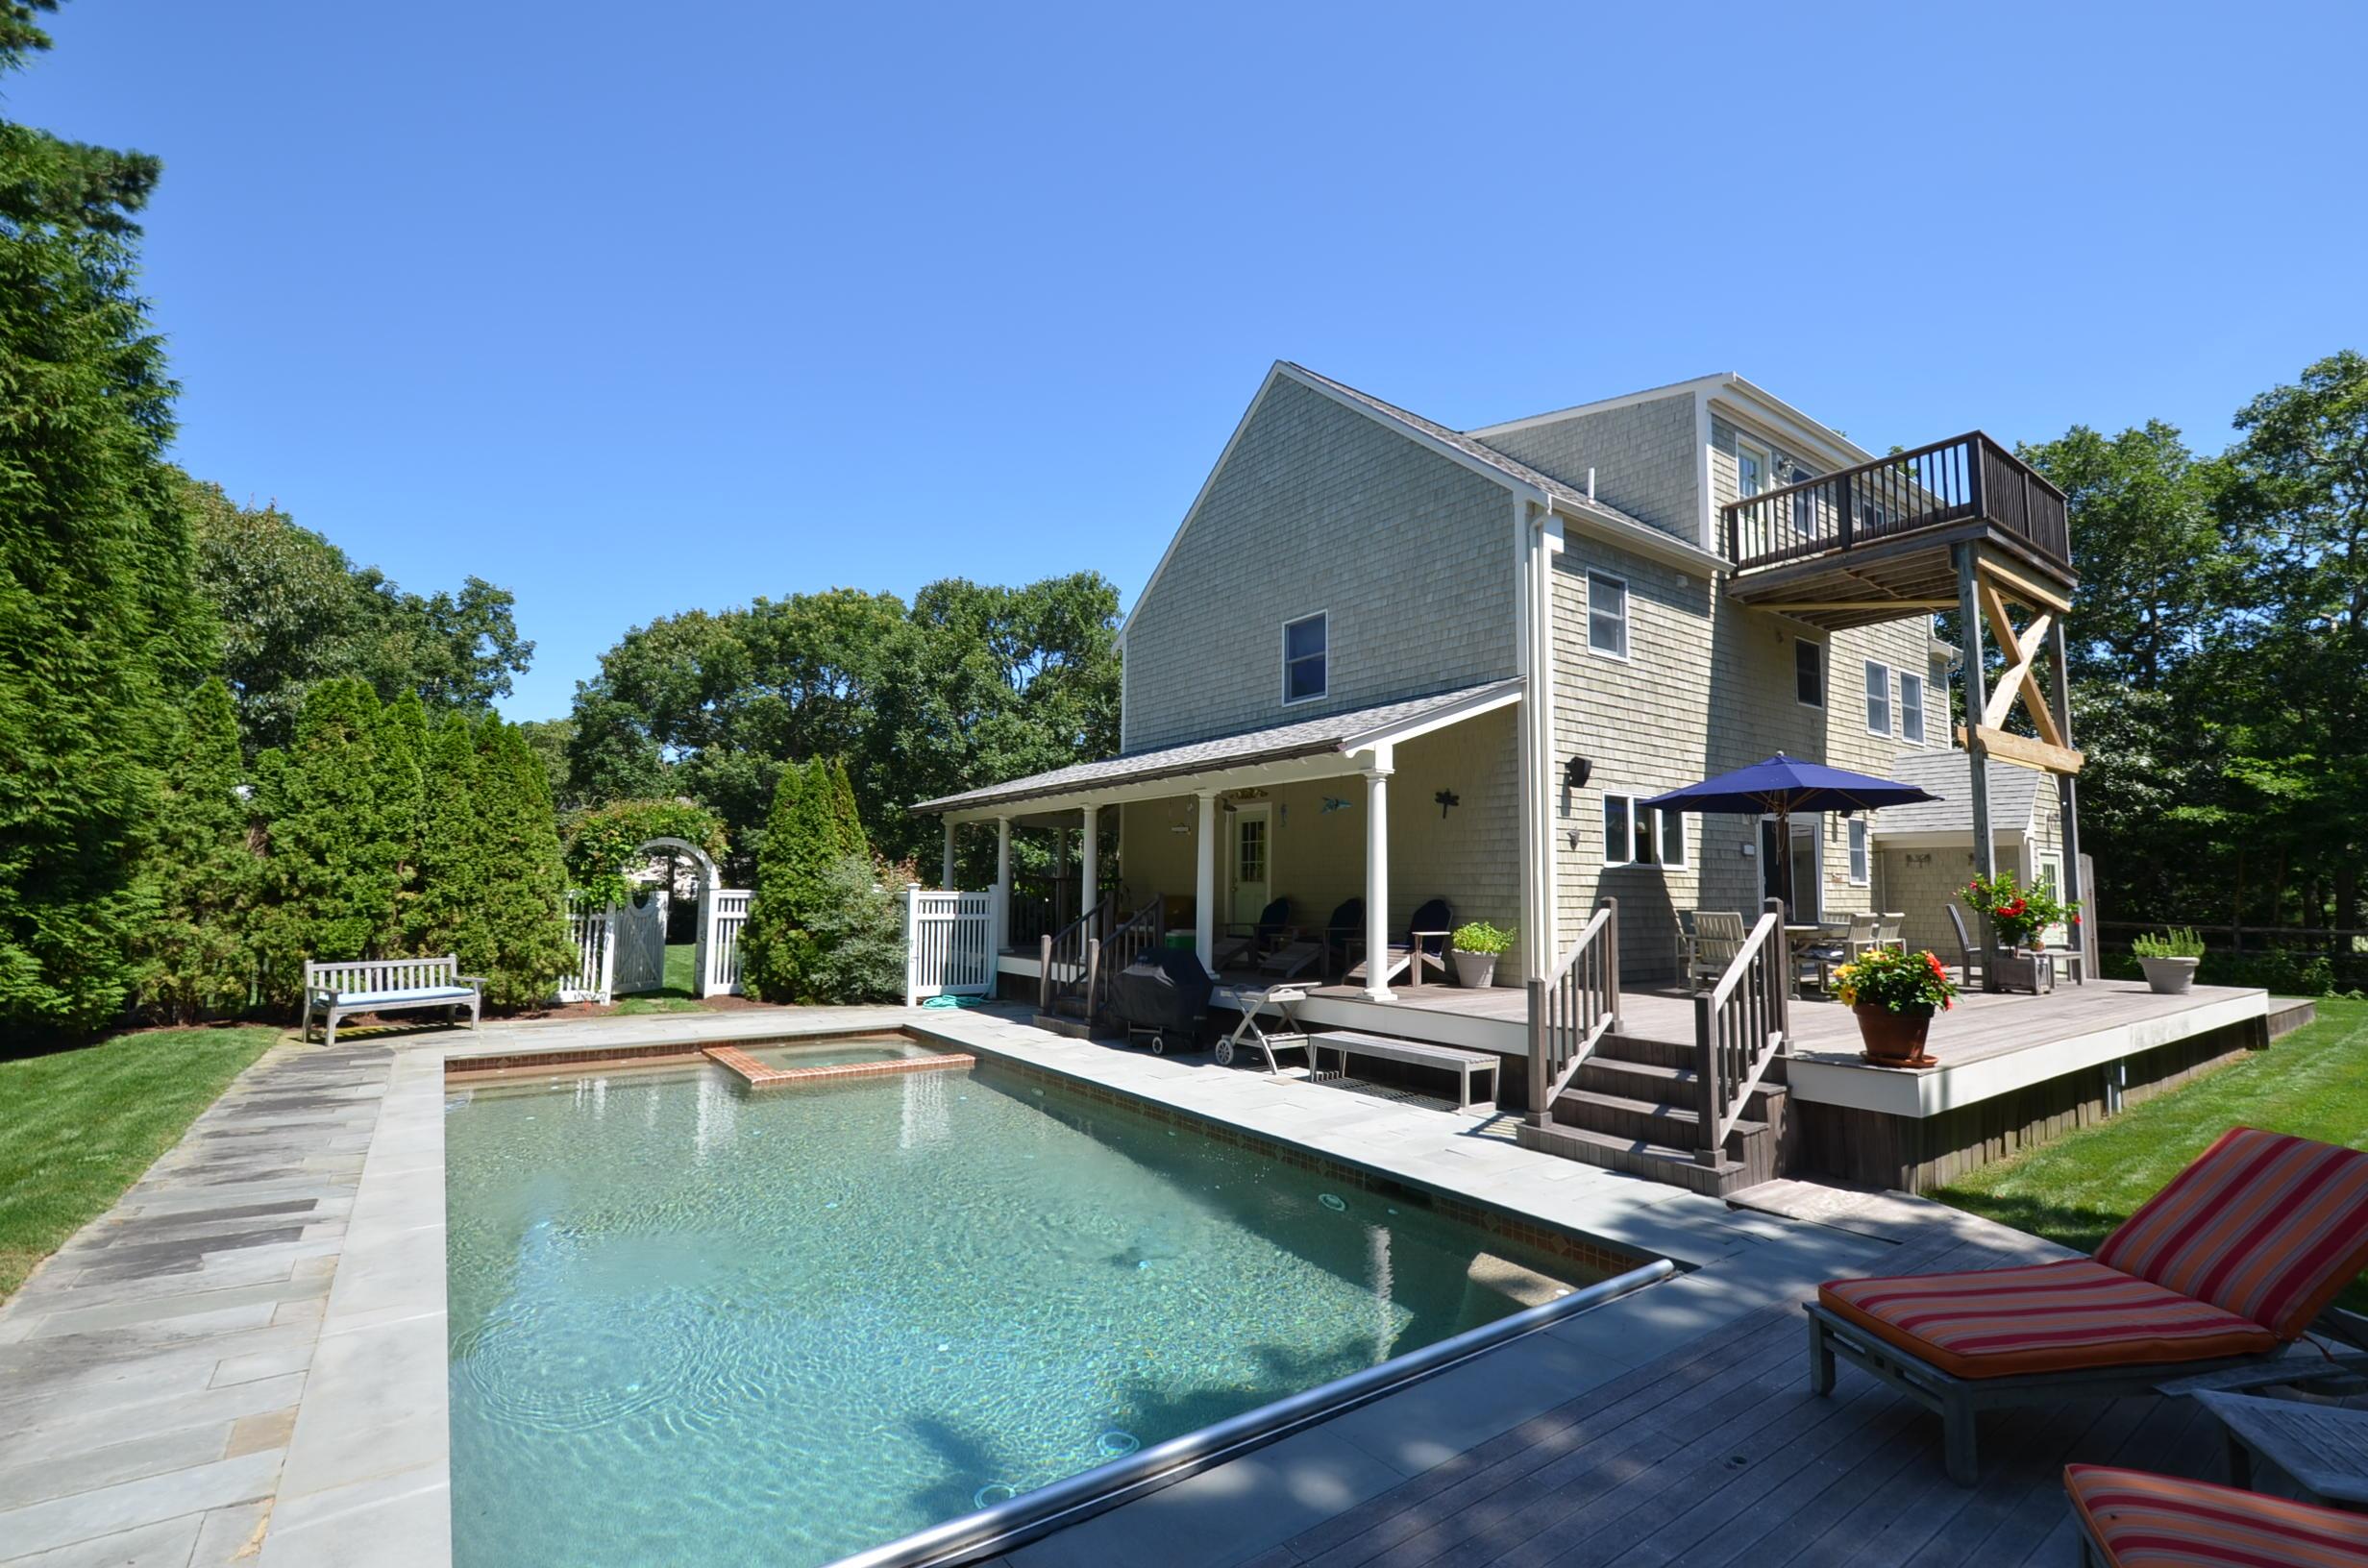 Recently Sold Martha39s Vineyard Real Estate Sold Mv Homes